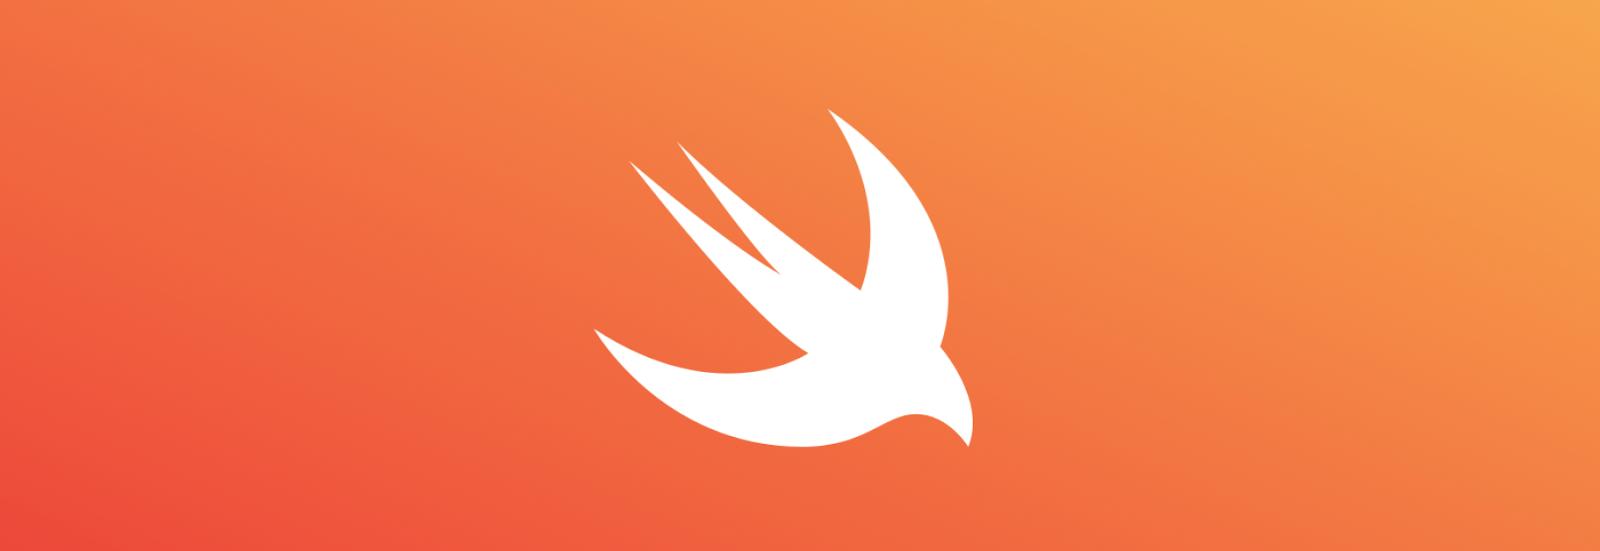 swift NotificationCenter 通知的简单用法 - 简书